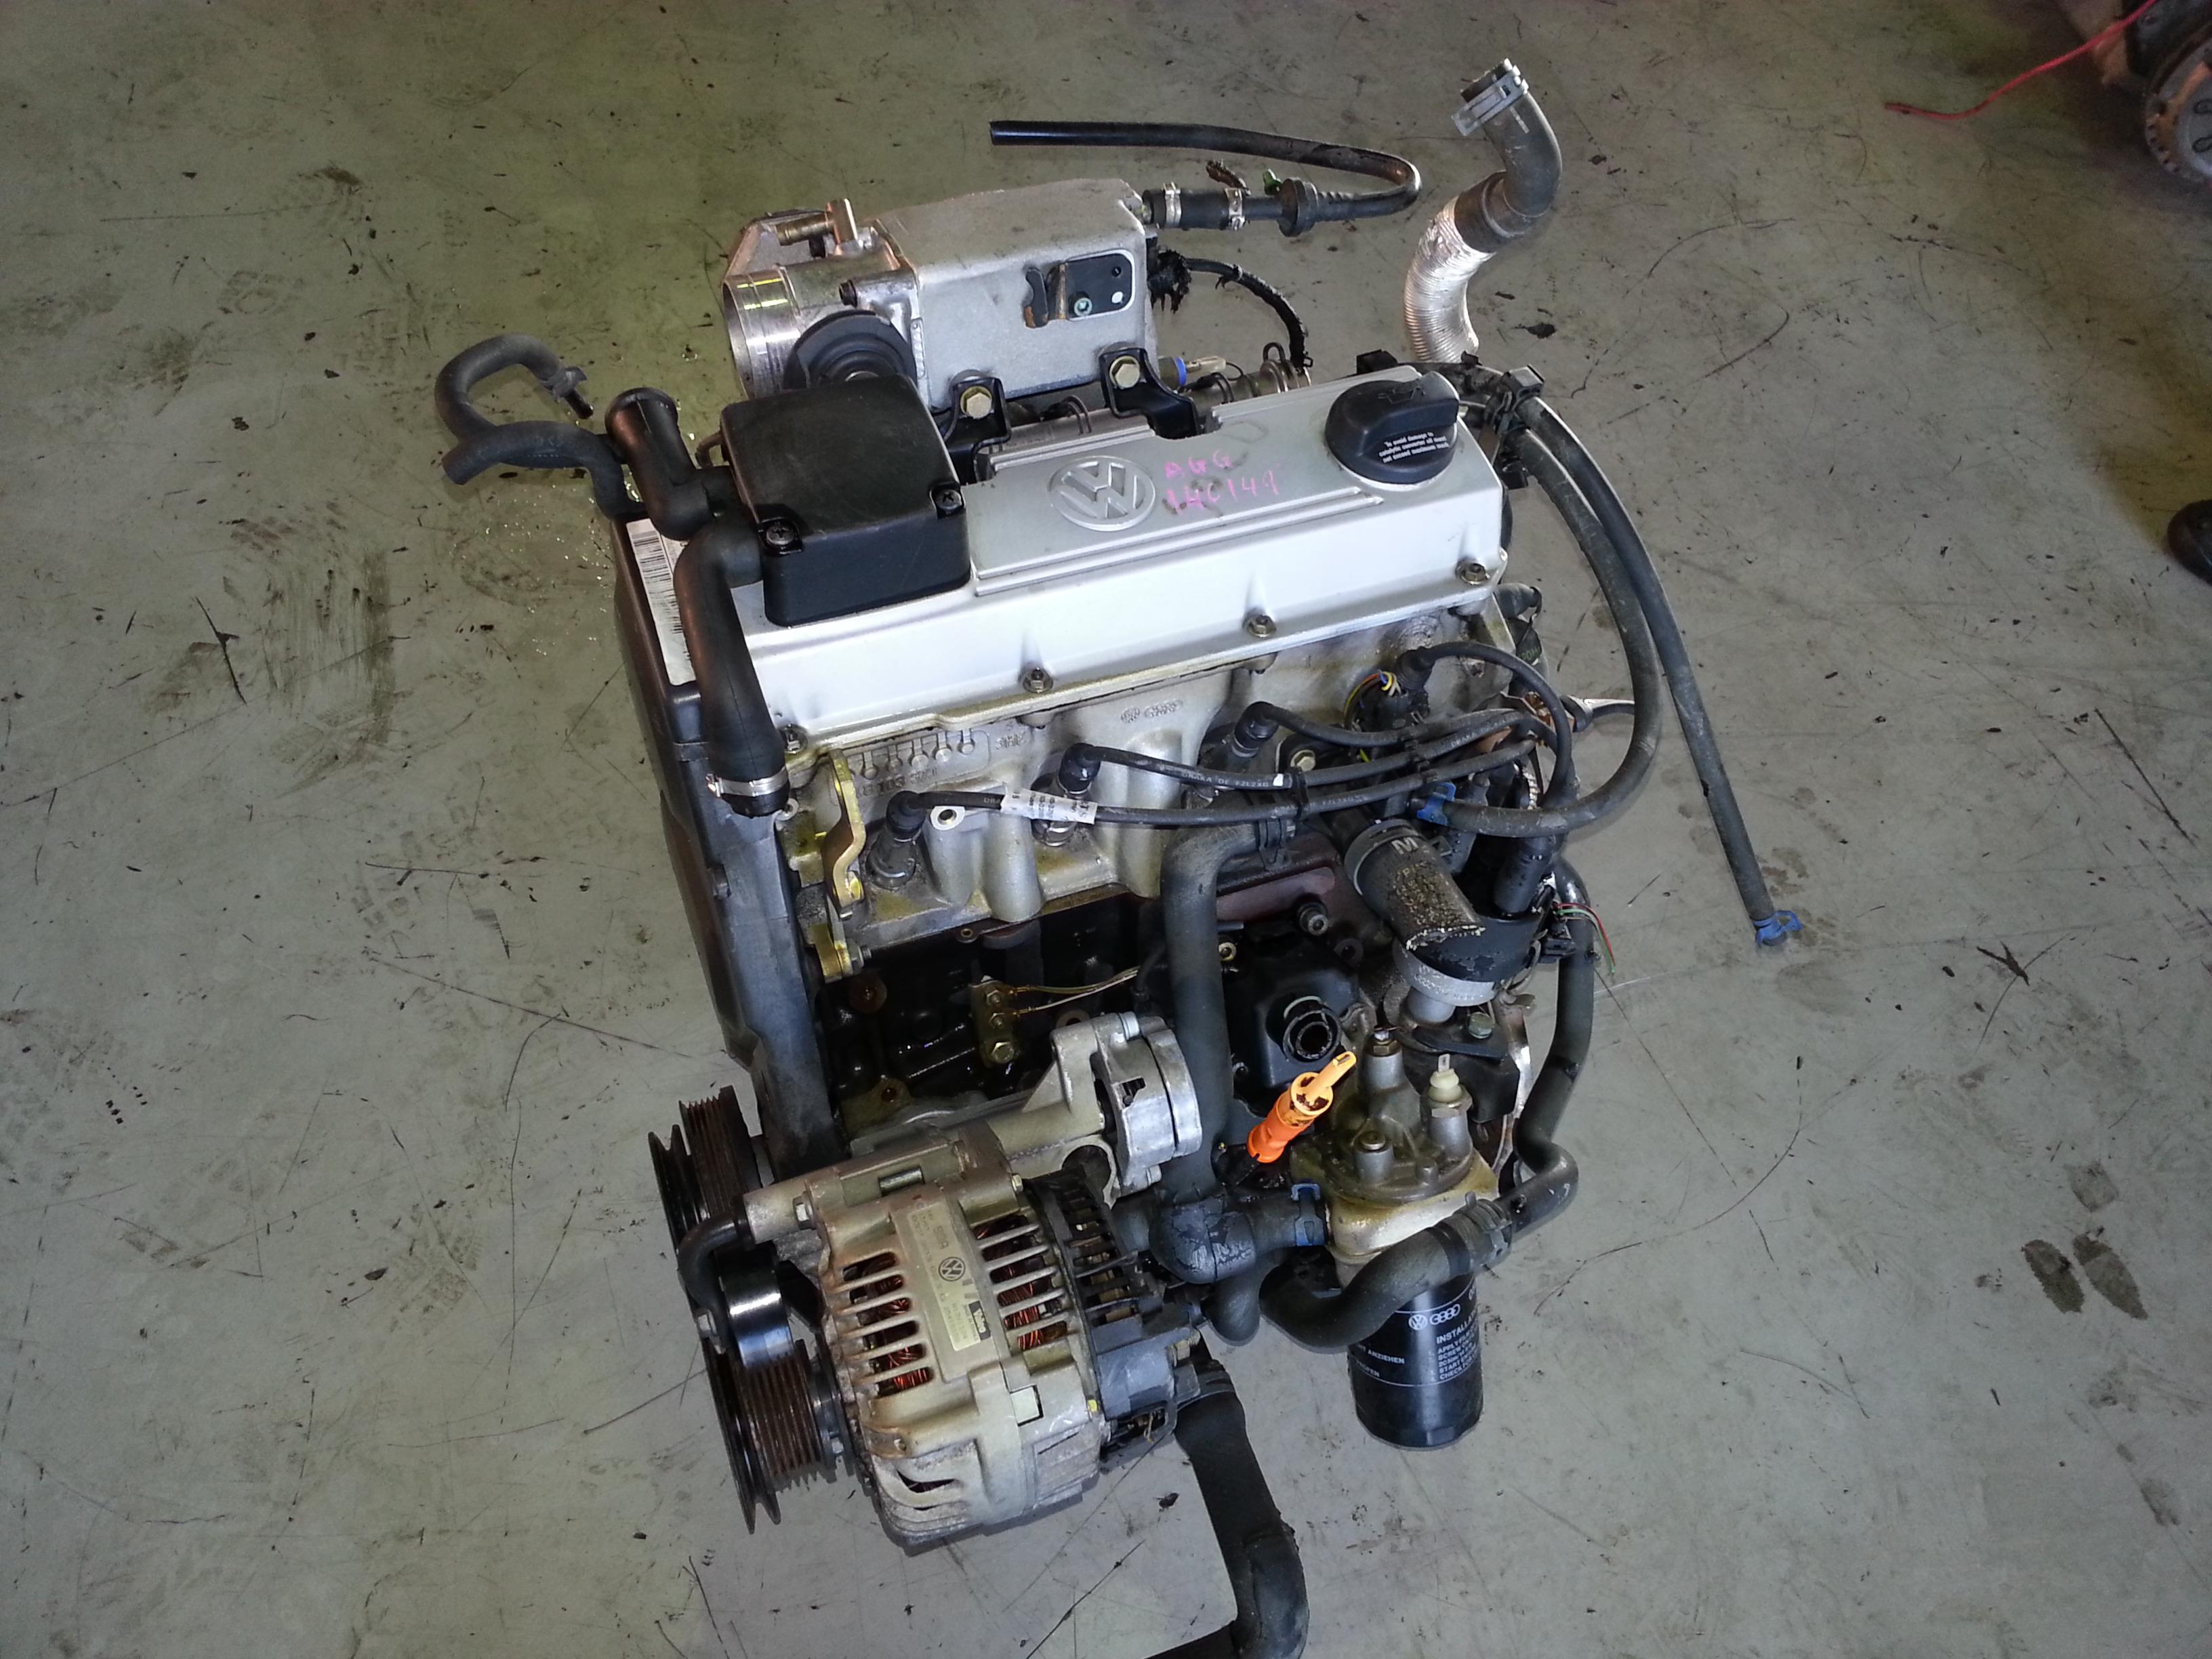 Vw Engines For Sale >> Vw Golf 2 0 8v Engine Ady Agg